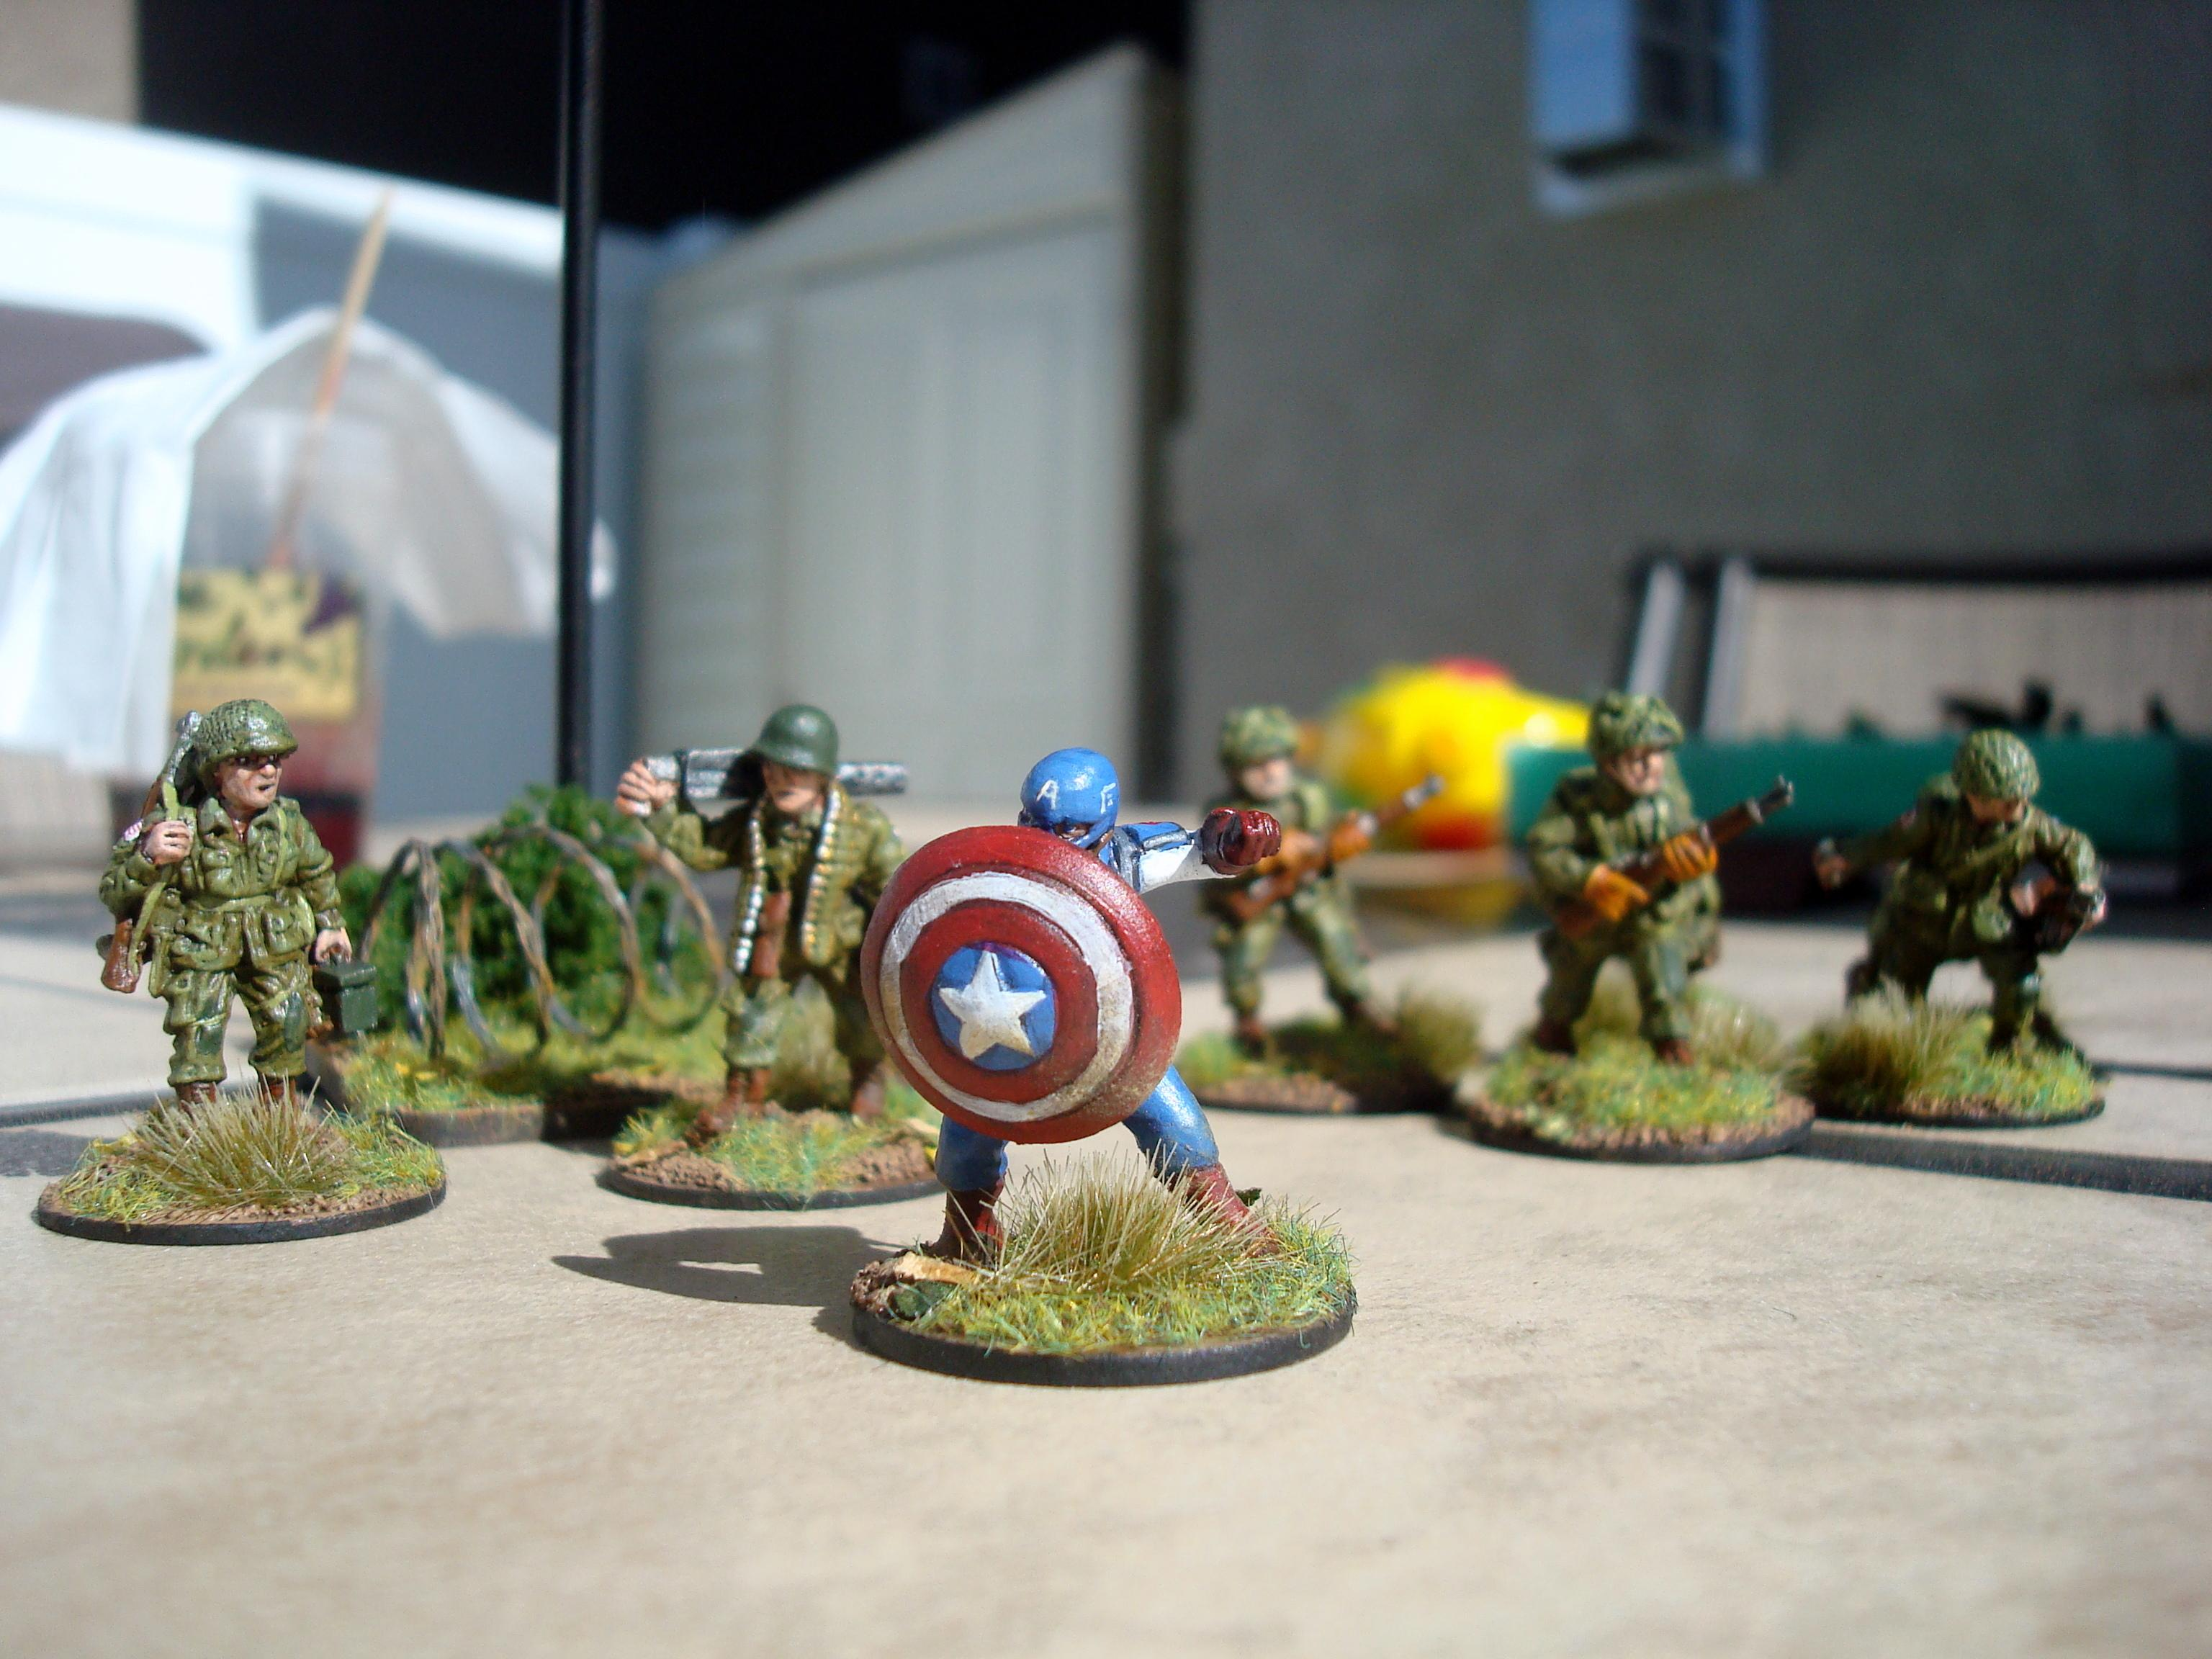 Airborne, America, Bolt Action, Captain America, Marvel, Paratrooper, Superhero, World War 2